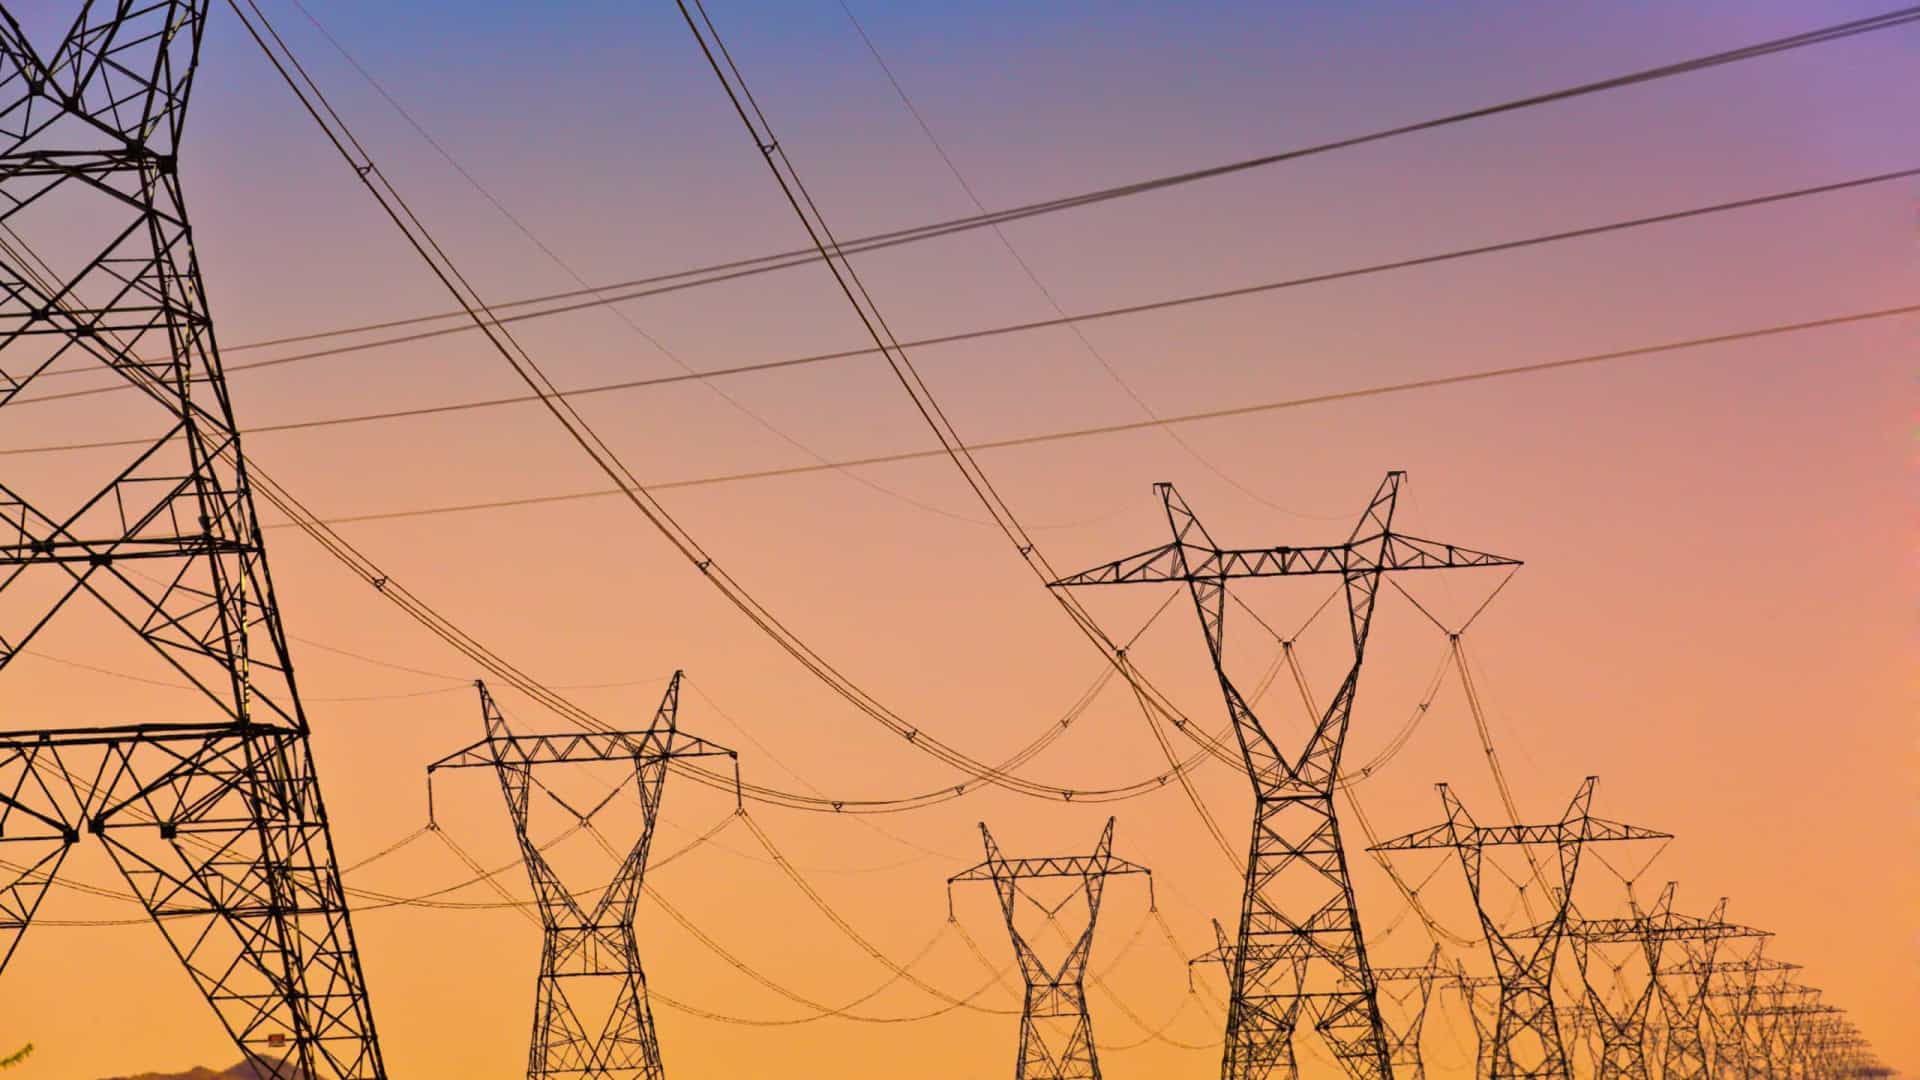 ERSE aprova descida de 3% na eletricidade para mercado regulado